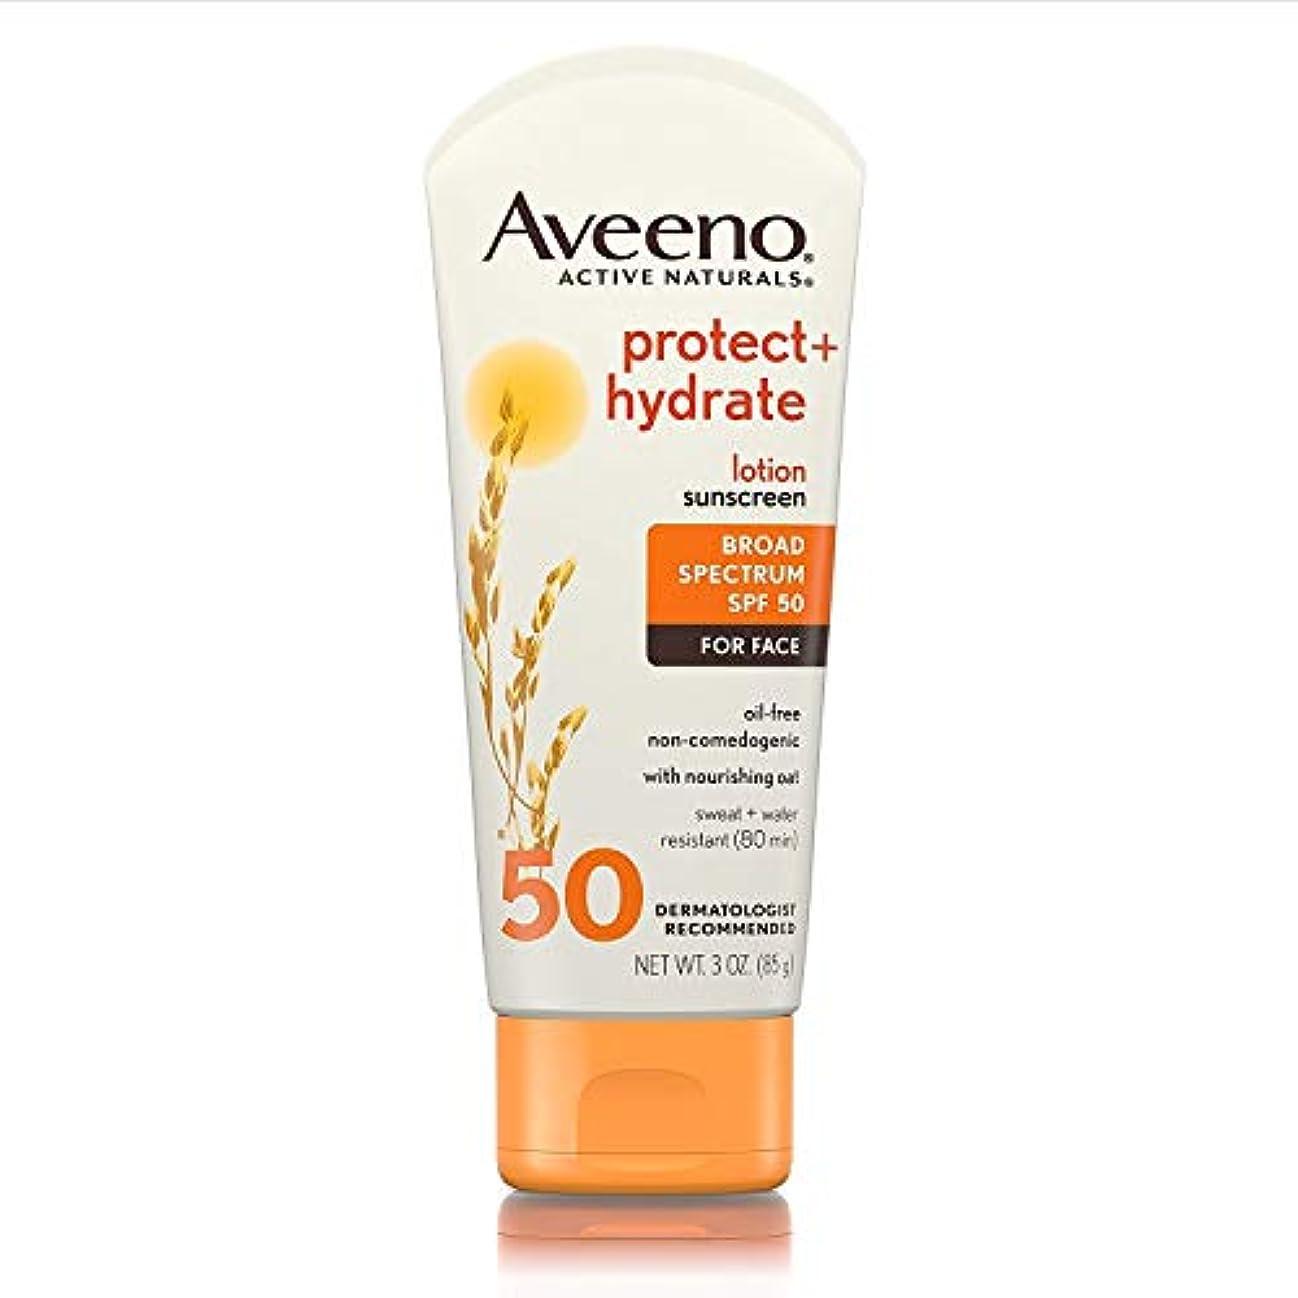 Aveeno アビーノ 日焼け止め ローションSPF-50 protect+hydrate Sunscreen Lotion(平行輸入品) 85g (3Oz)